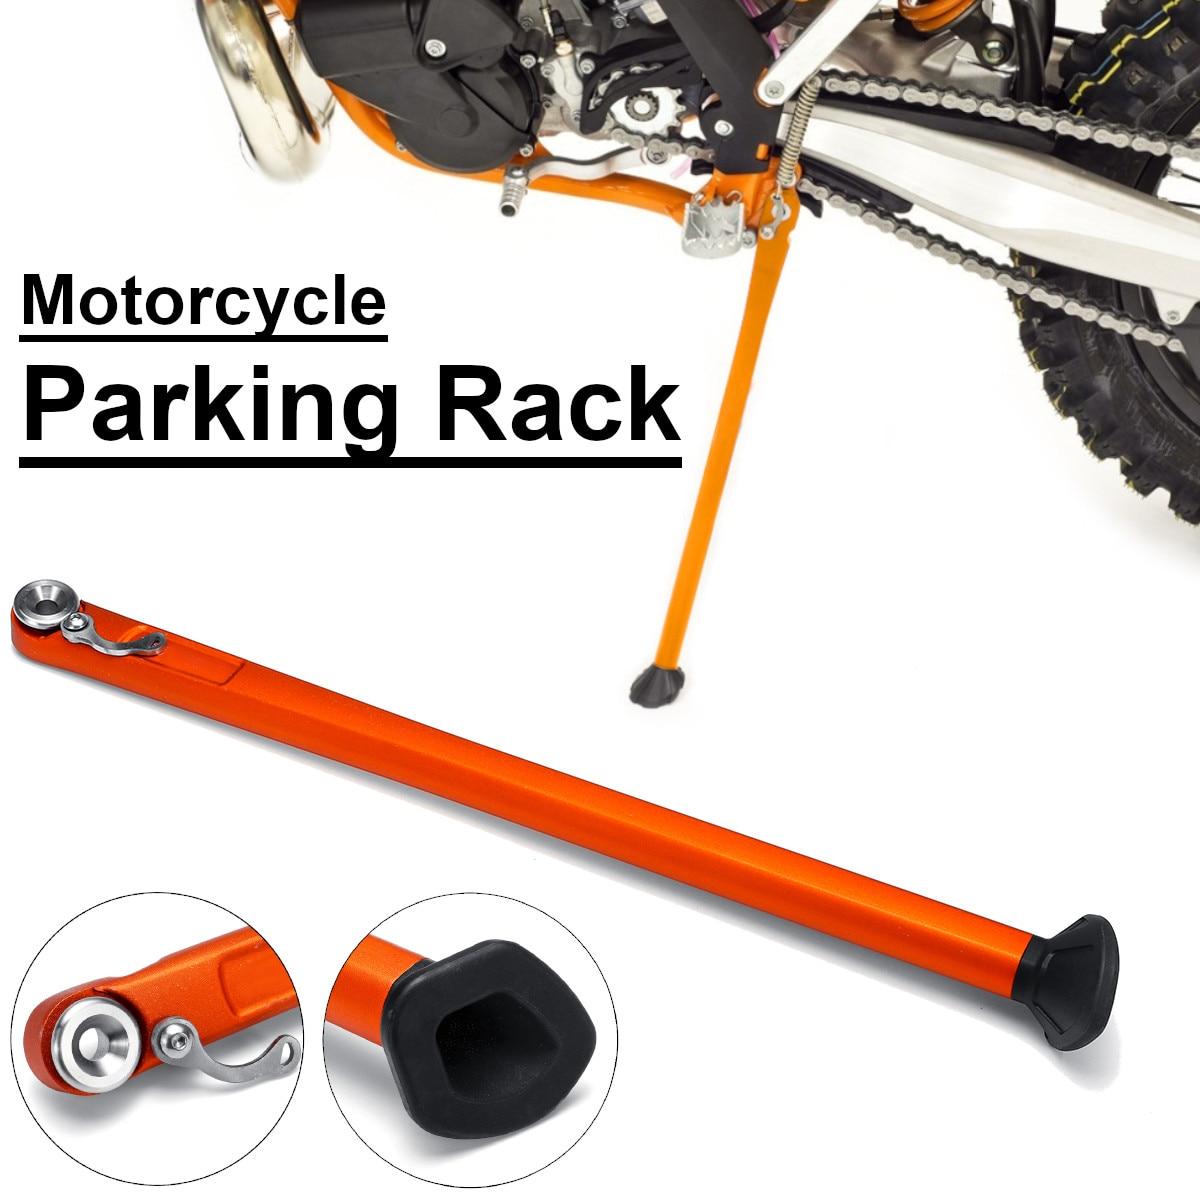 Стойка для парковки мотоцикла, боковая подставка для KTM для HUSABERG для HUSQVARNA 150 250 300 350 400 450 500 505 530 XC XCF